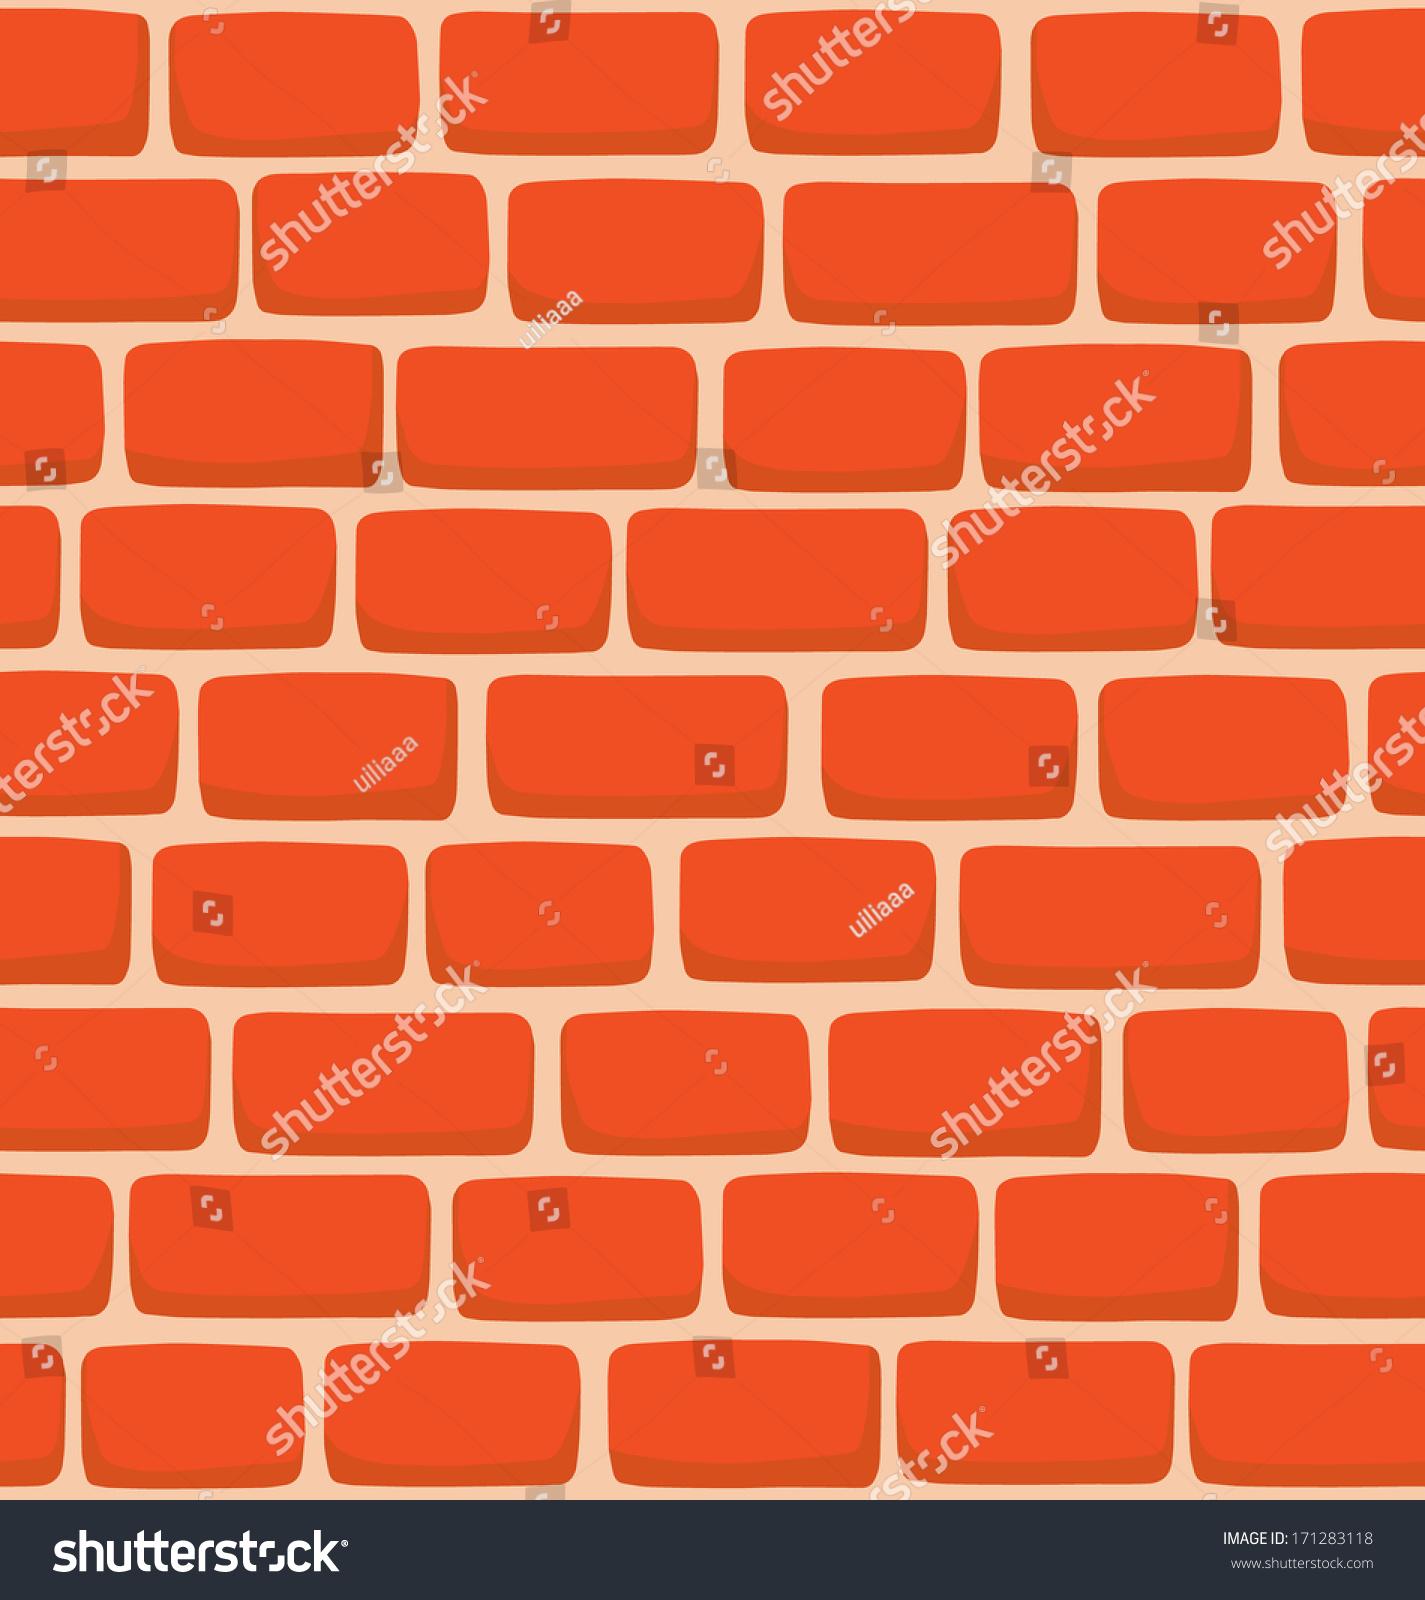 Seamless Texture Cartoon Brick Wall Stock Vector 171283118